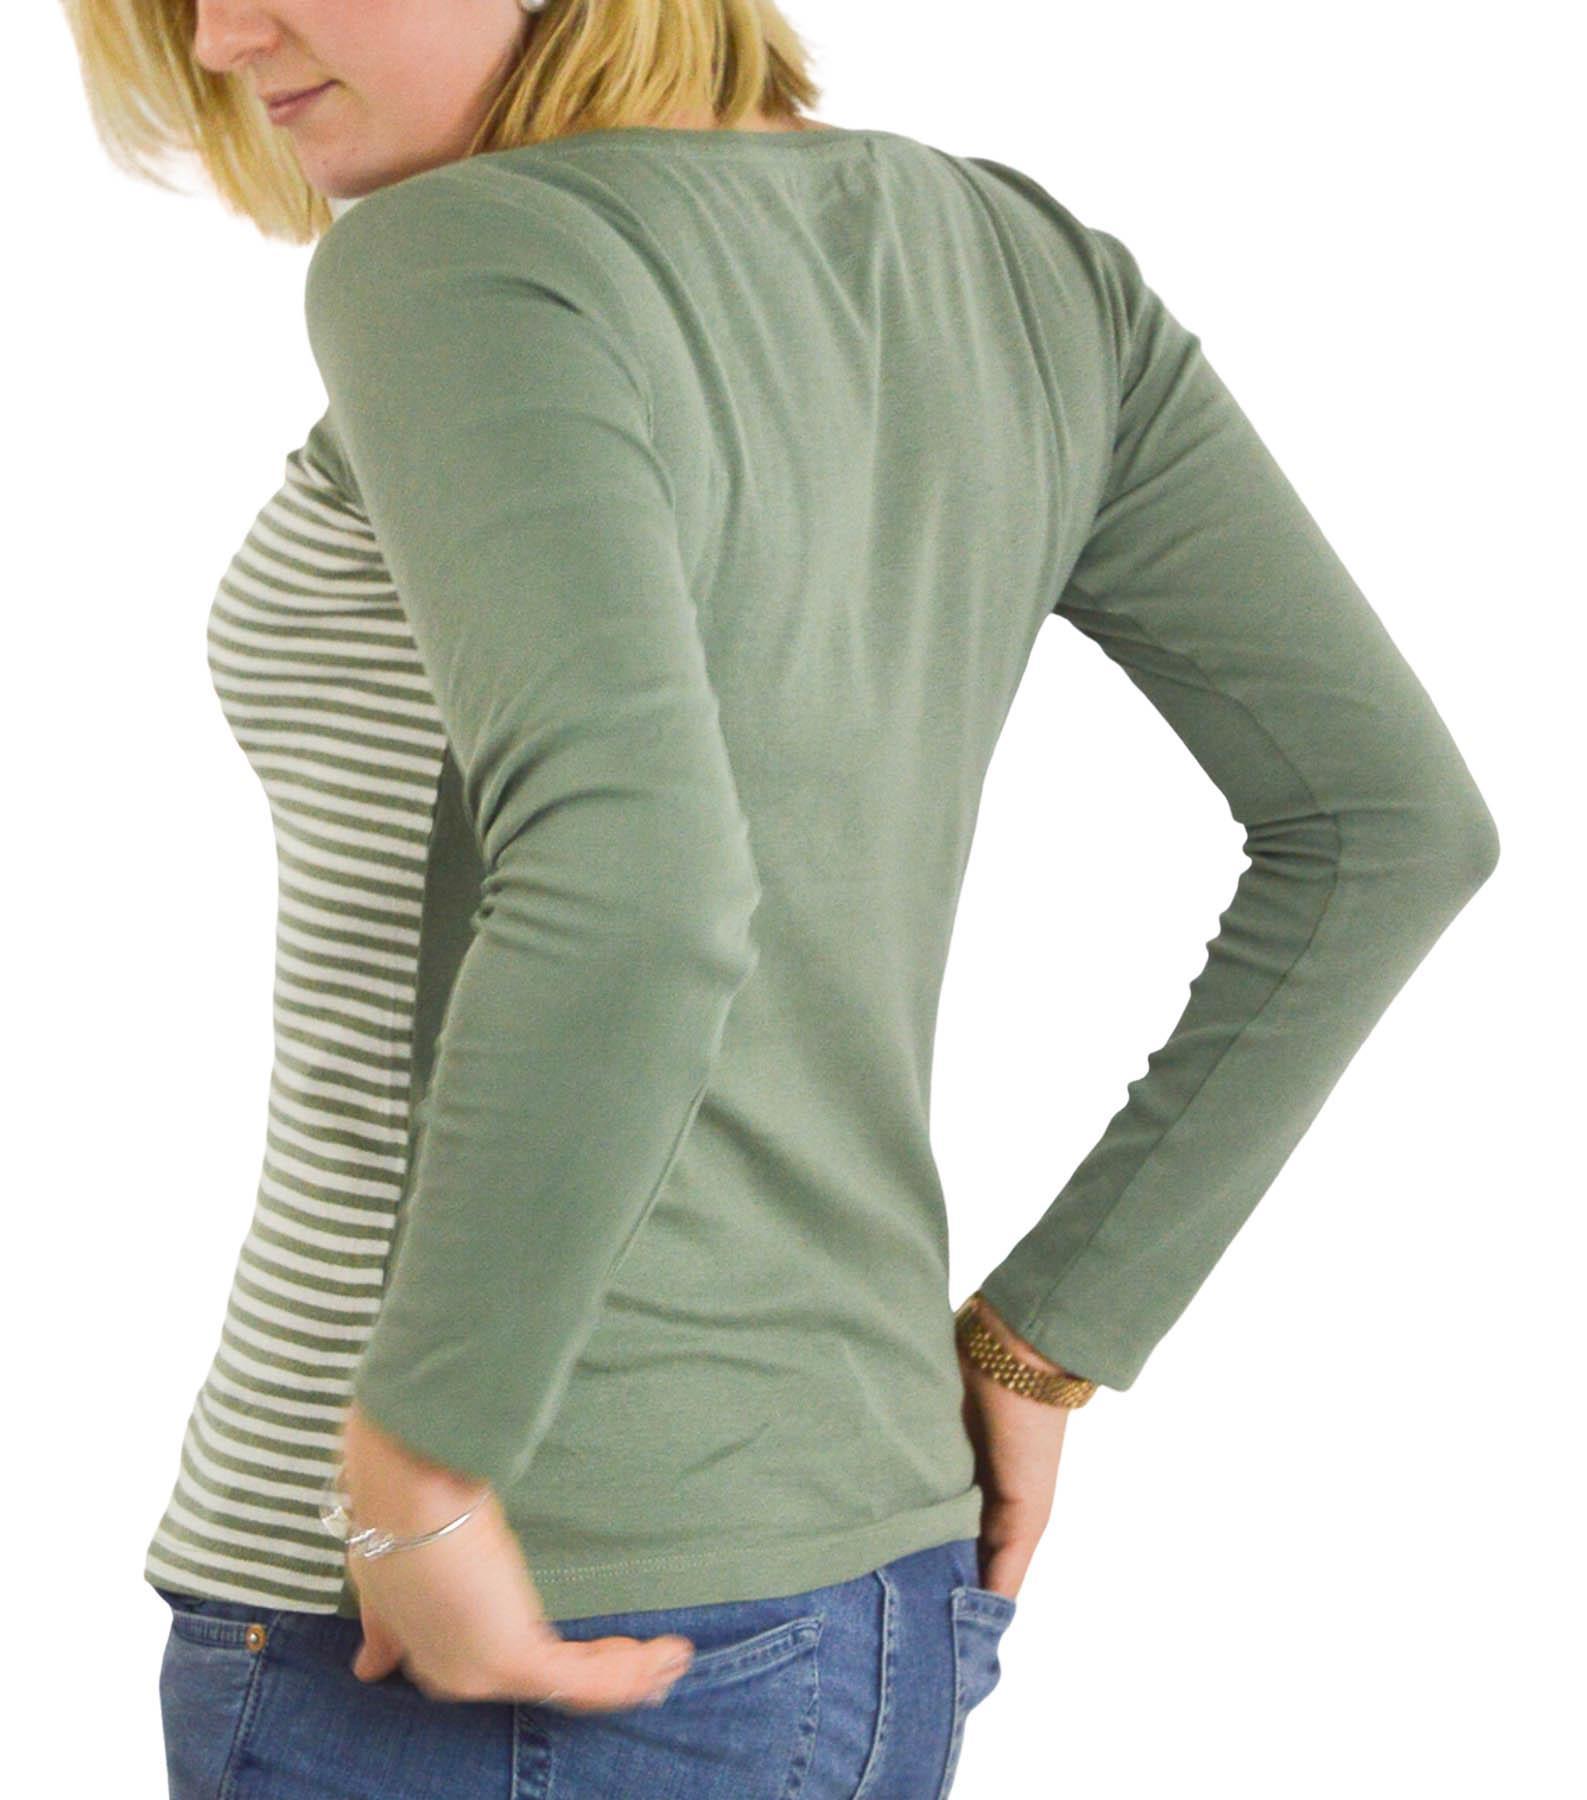 Femmes-a-Rayures-T-shirt-manches-longues-haut-en-jersey-col-rond-kaki-ou-Bleu-marine-Taille-6-24 miniature 7